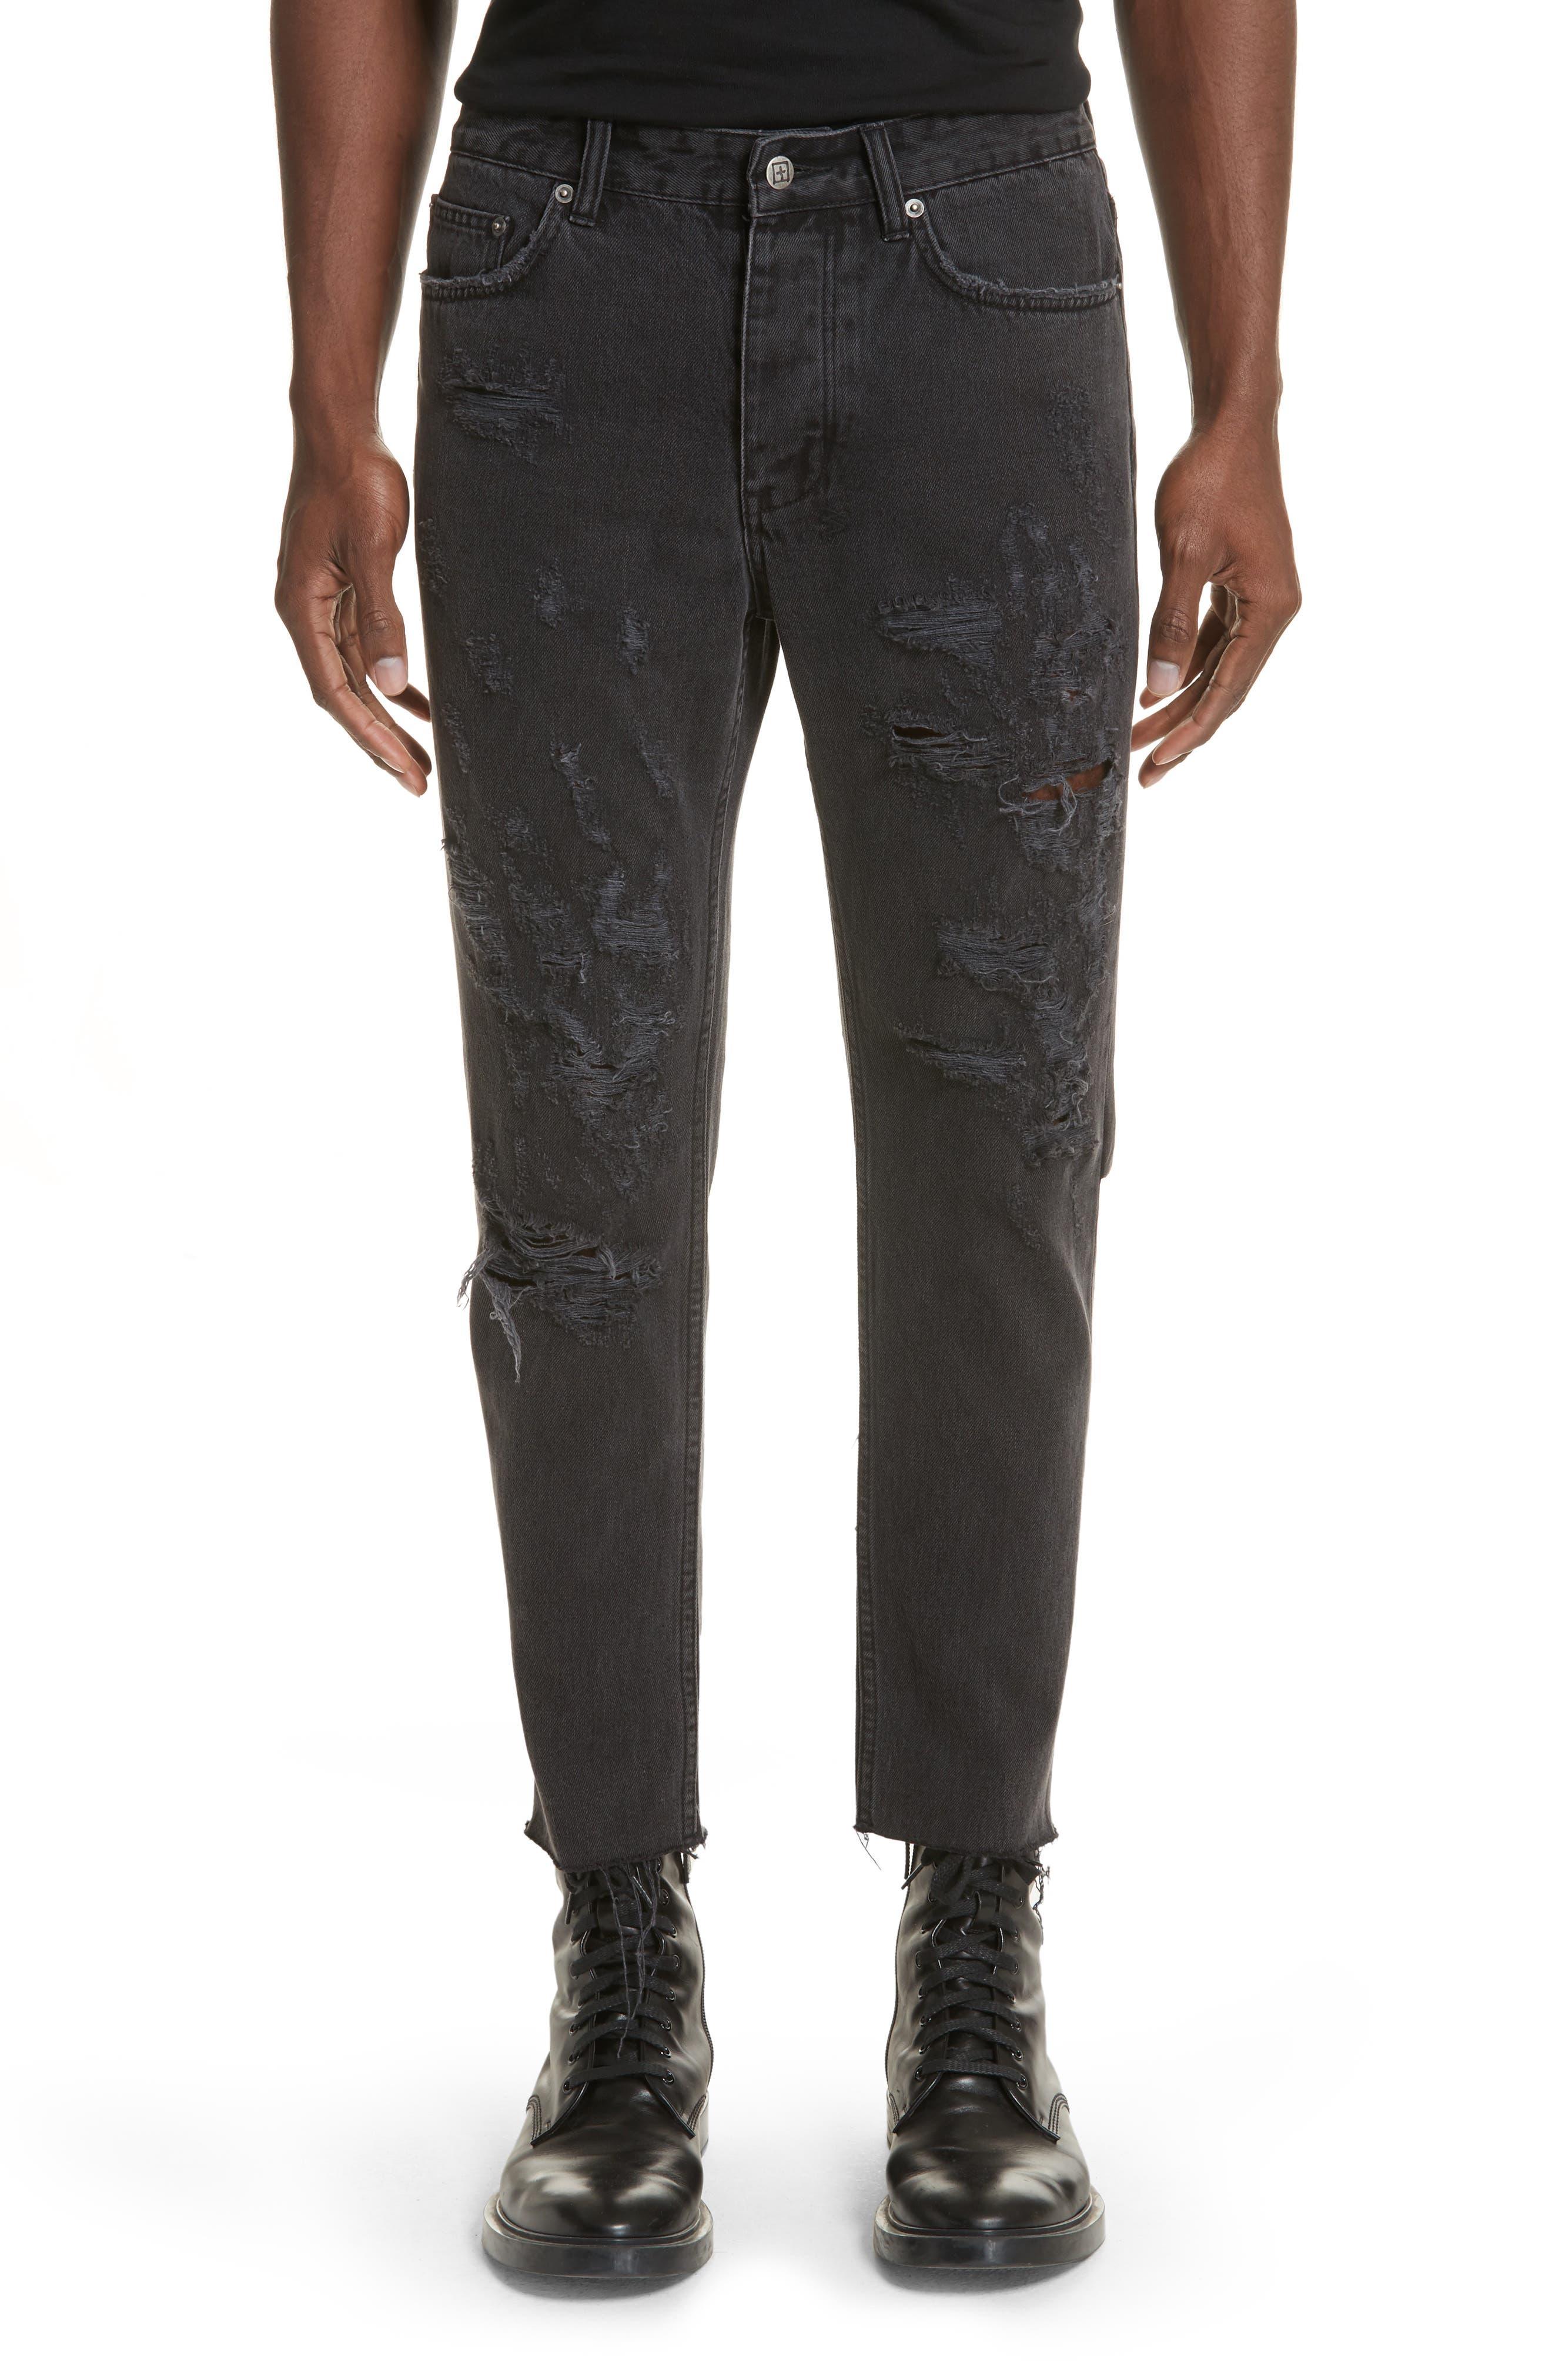 Chitch Chop Rat Attack Jeans,                         Main,                         color, Black